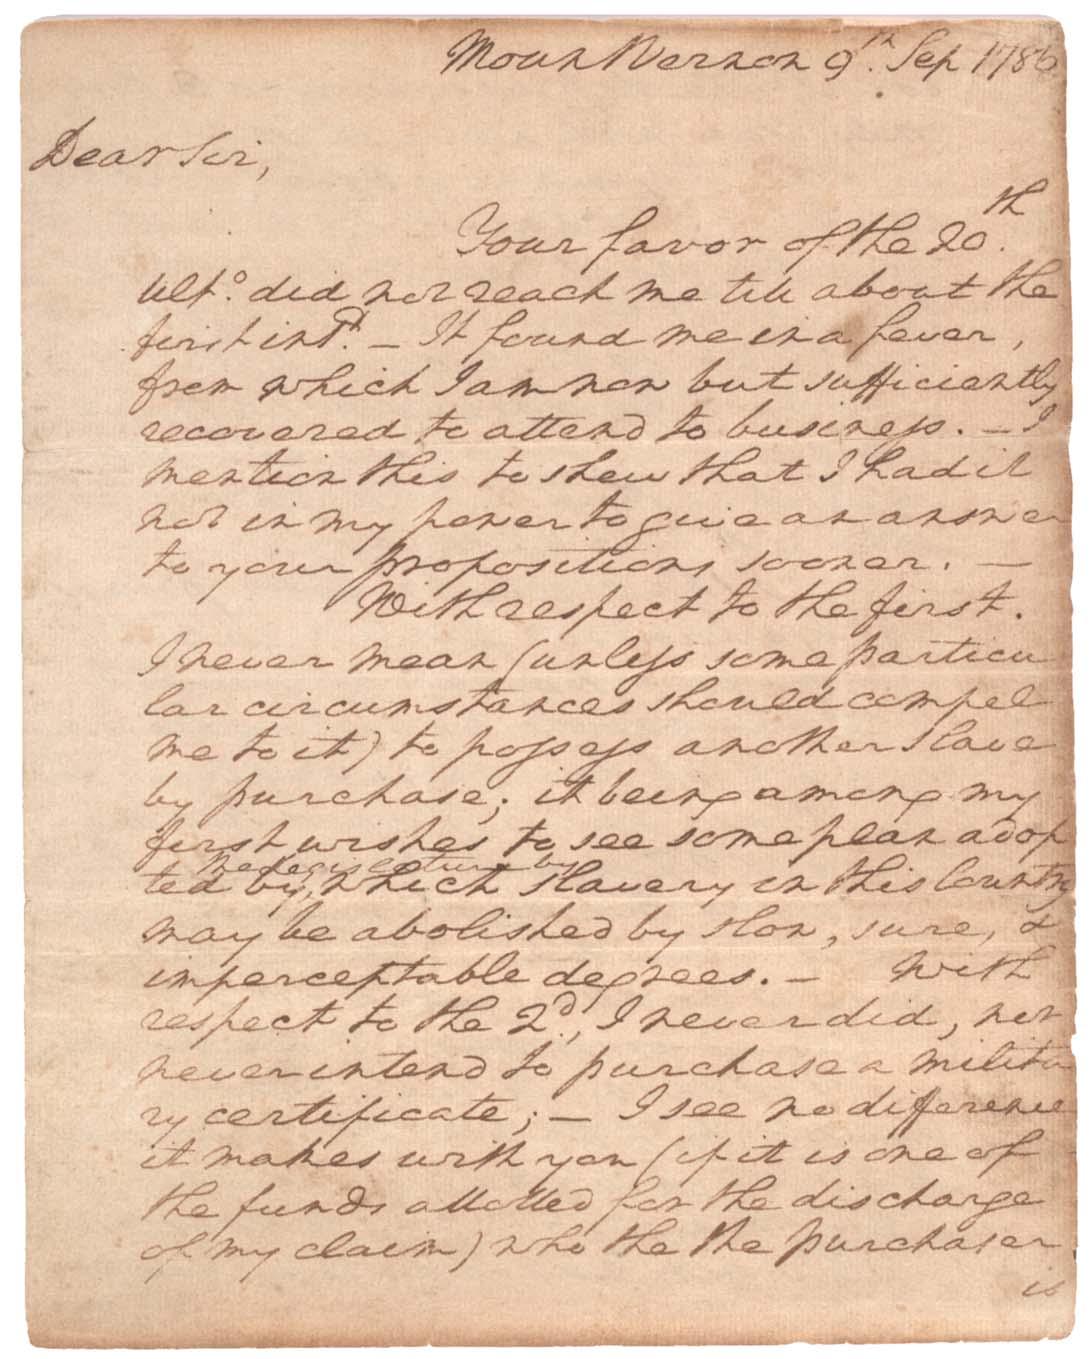 George Washington to John Francis Mercer, September 9, 1786. (Gilder Lehrman